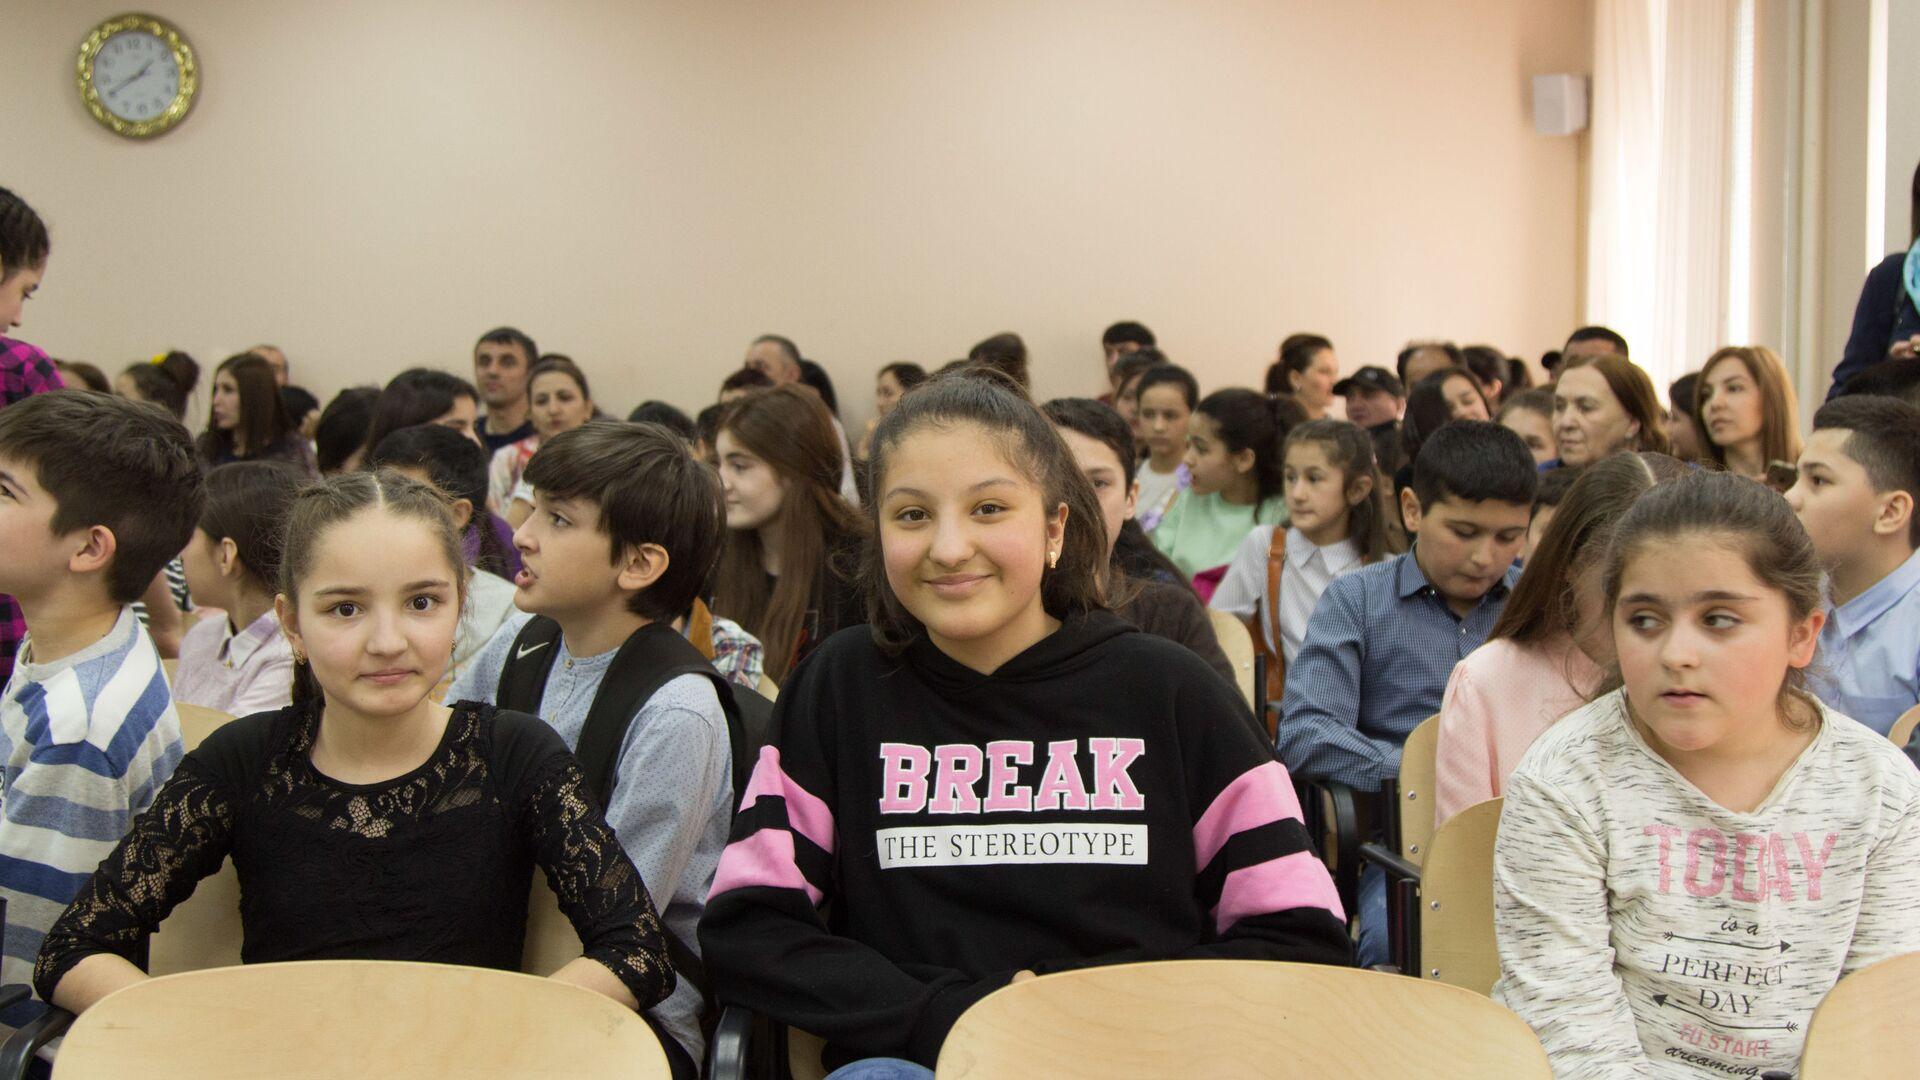 Культурный центр НУР провел школьную олимпиаду для школьников-таджиков - Sputnik Таджикистан, 1920, 30.03.2021